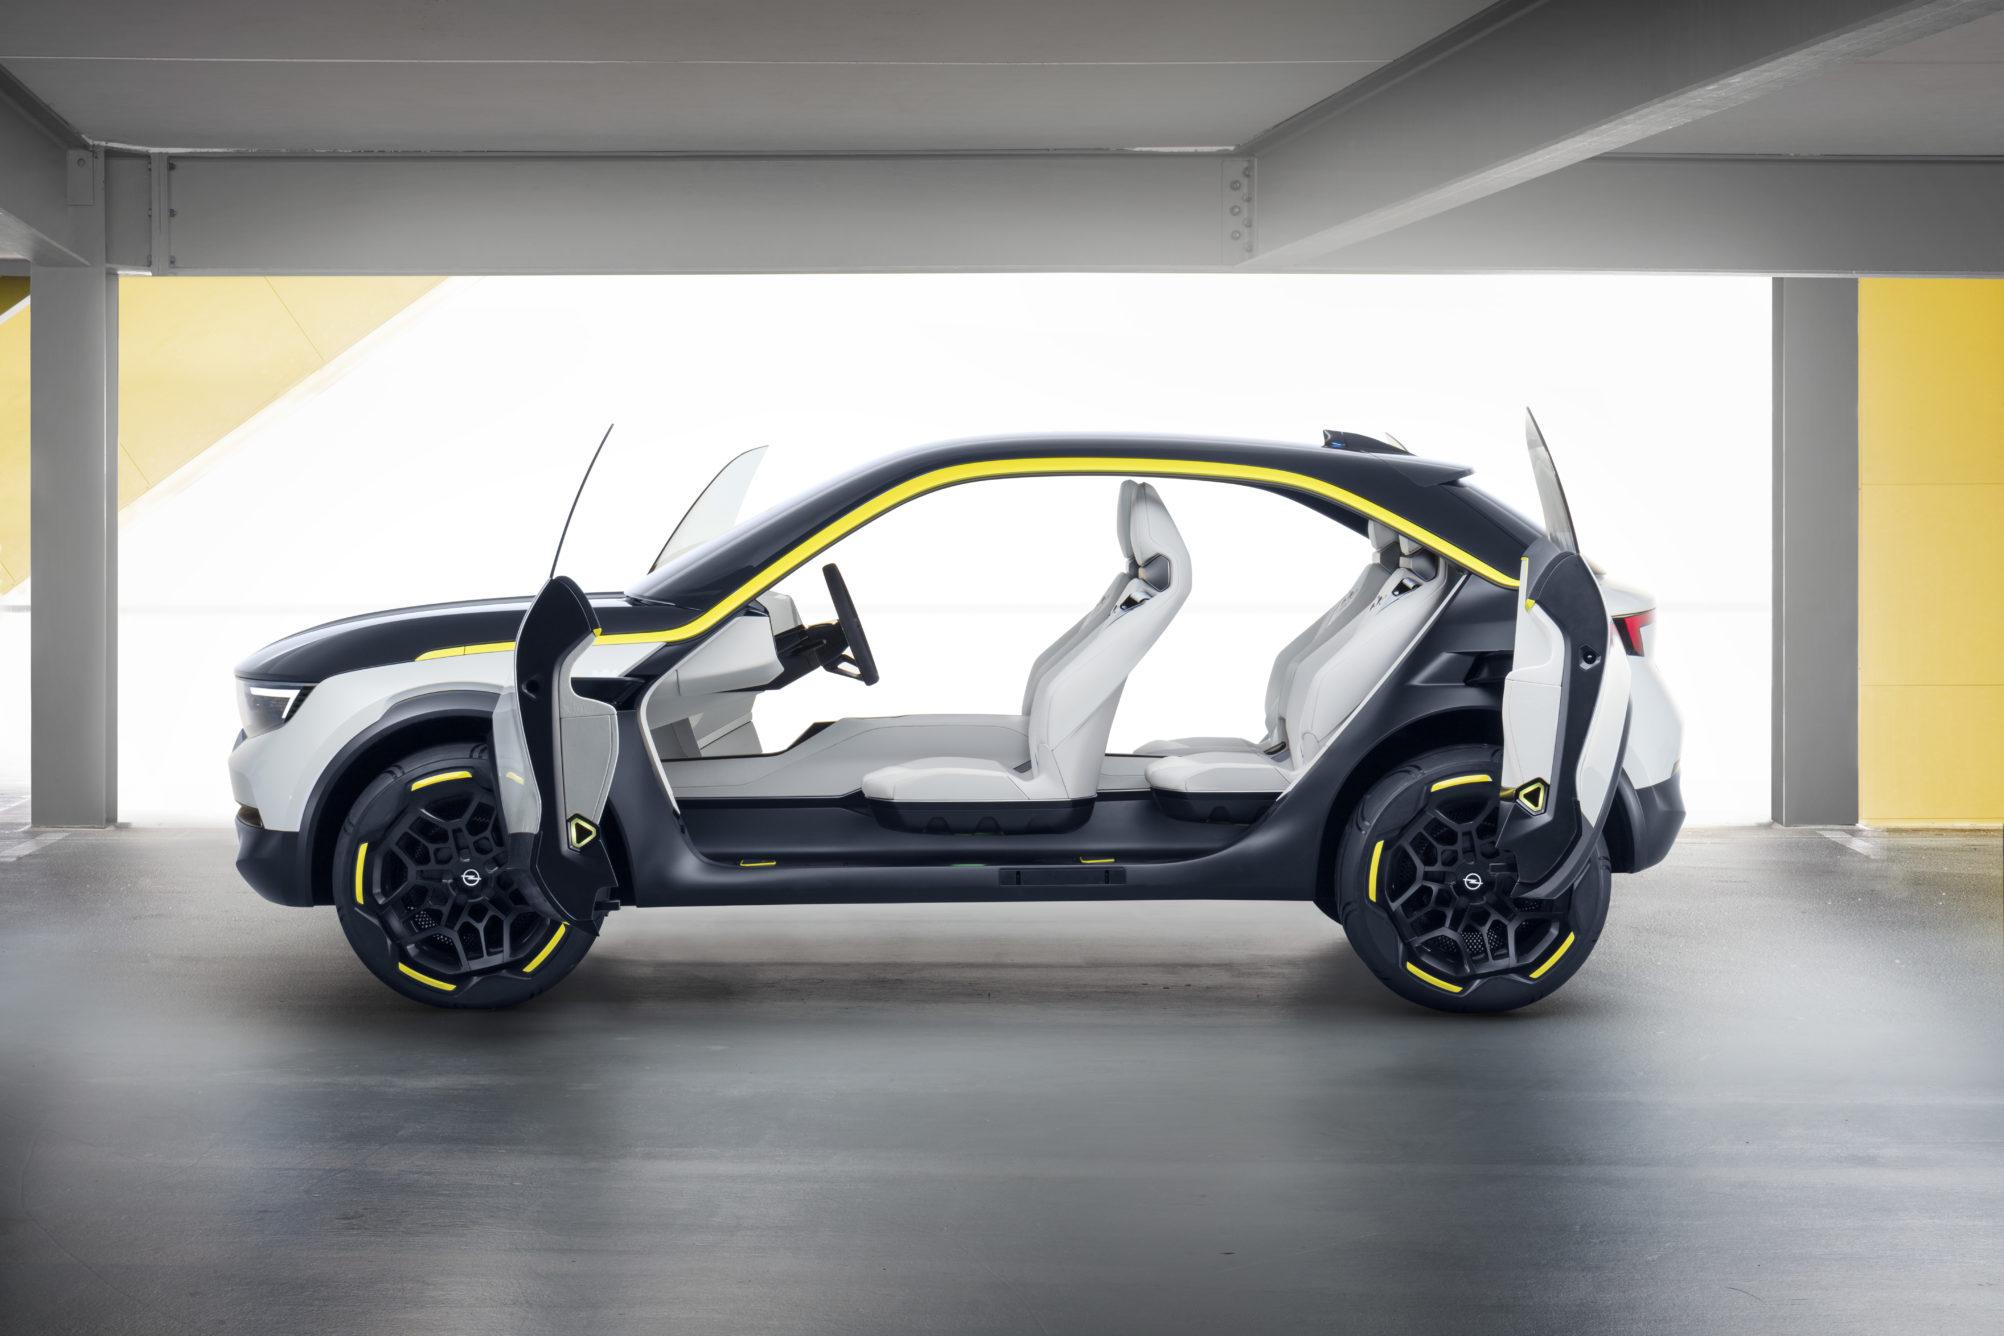 2018 Opel GT Experimental X